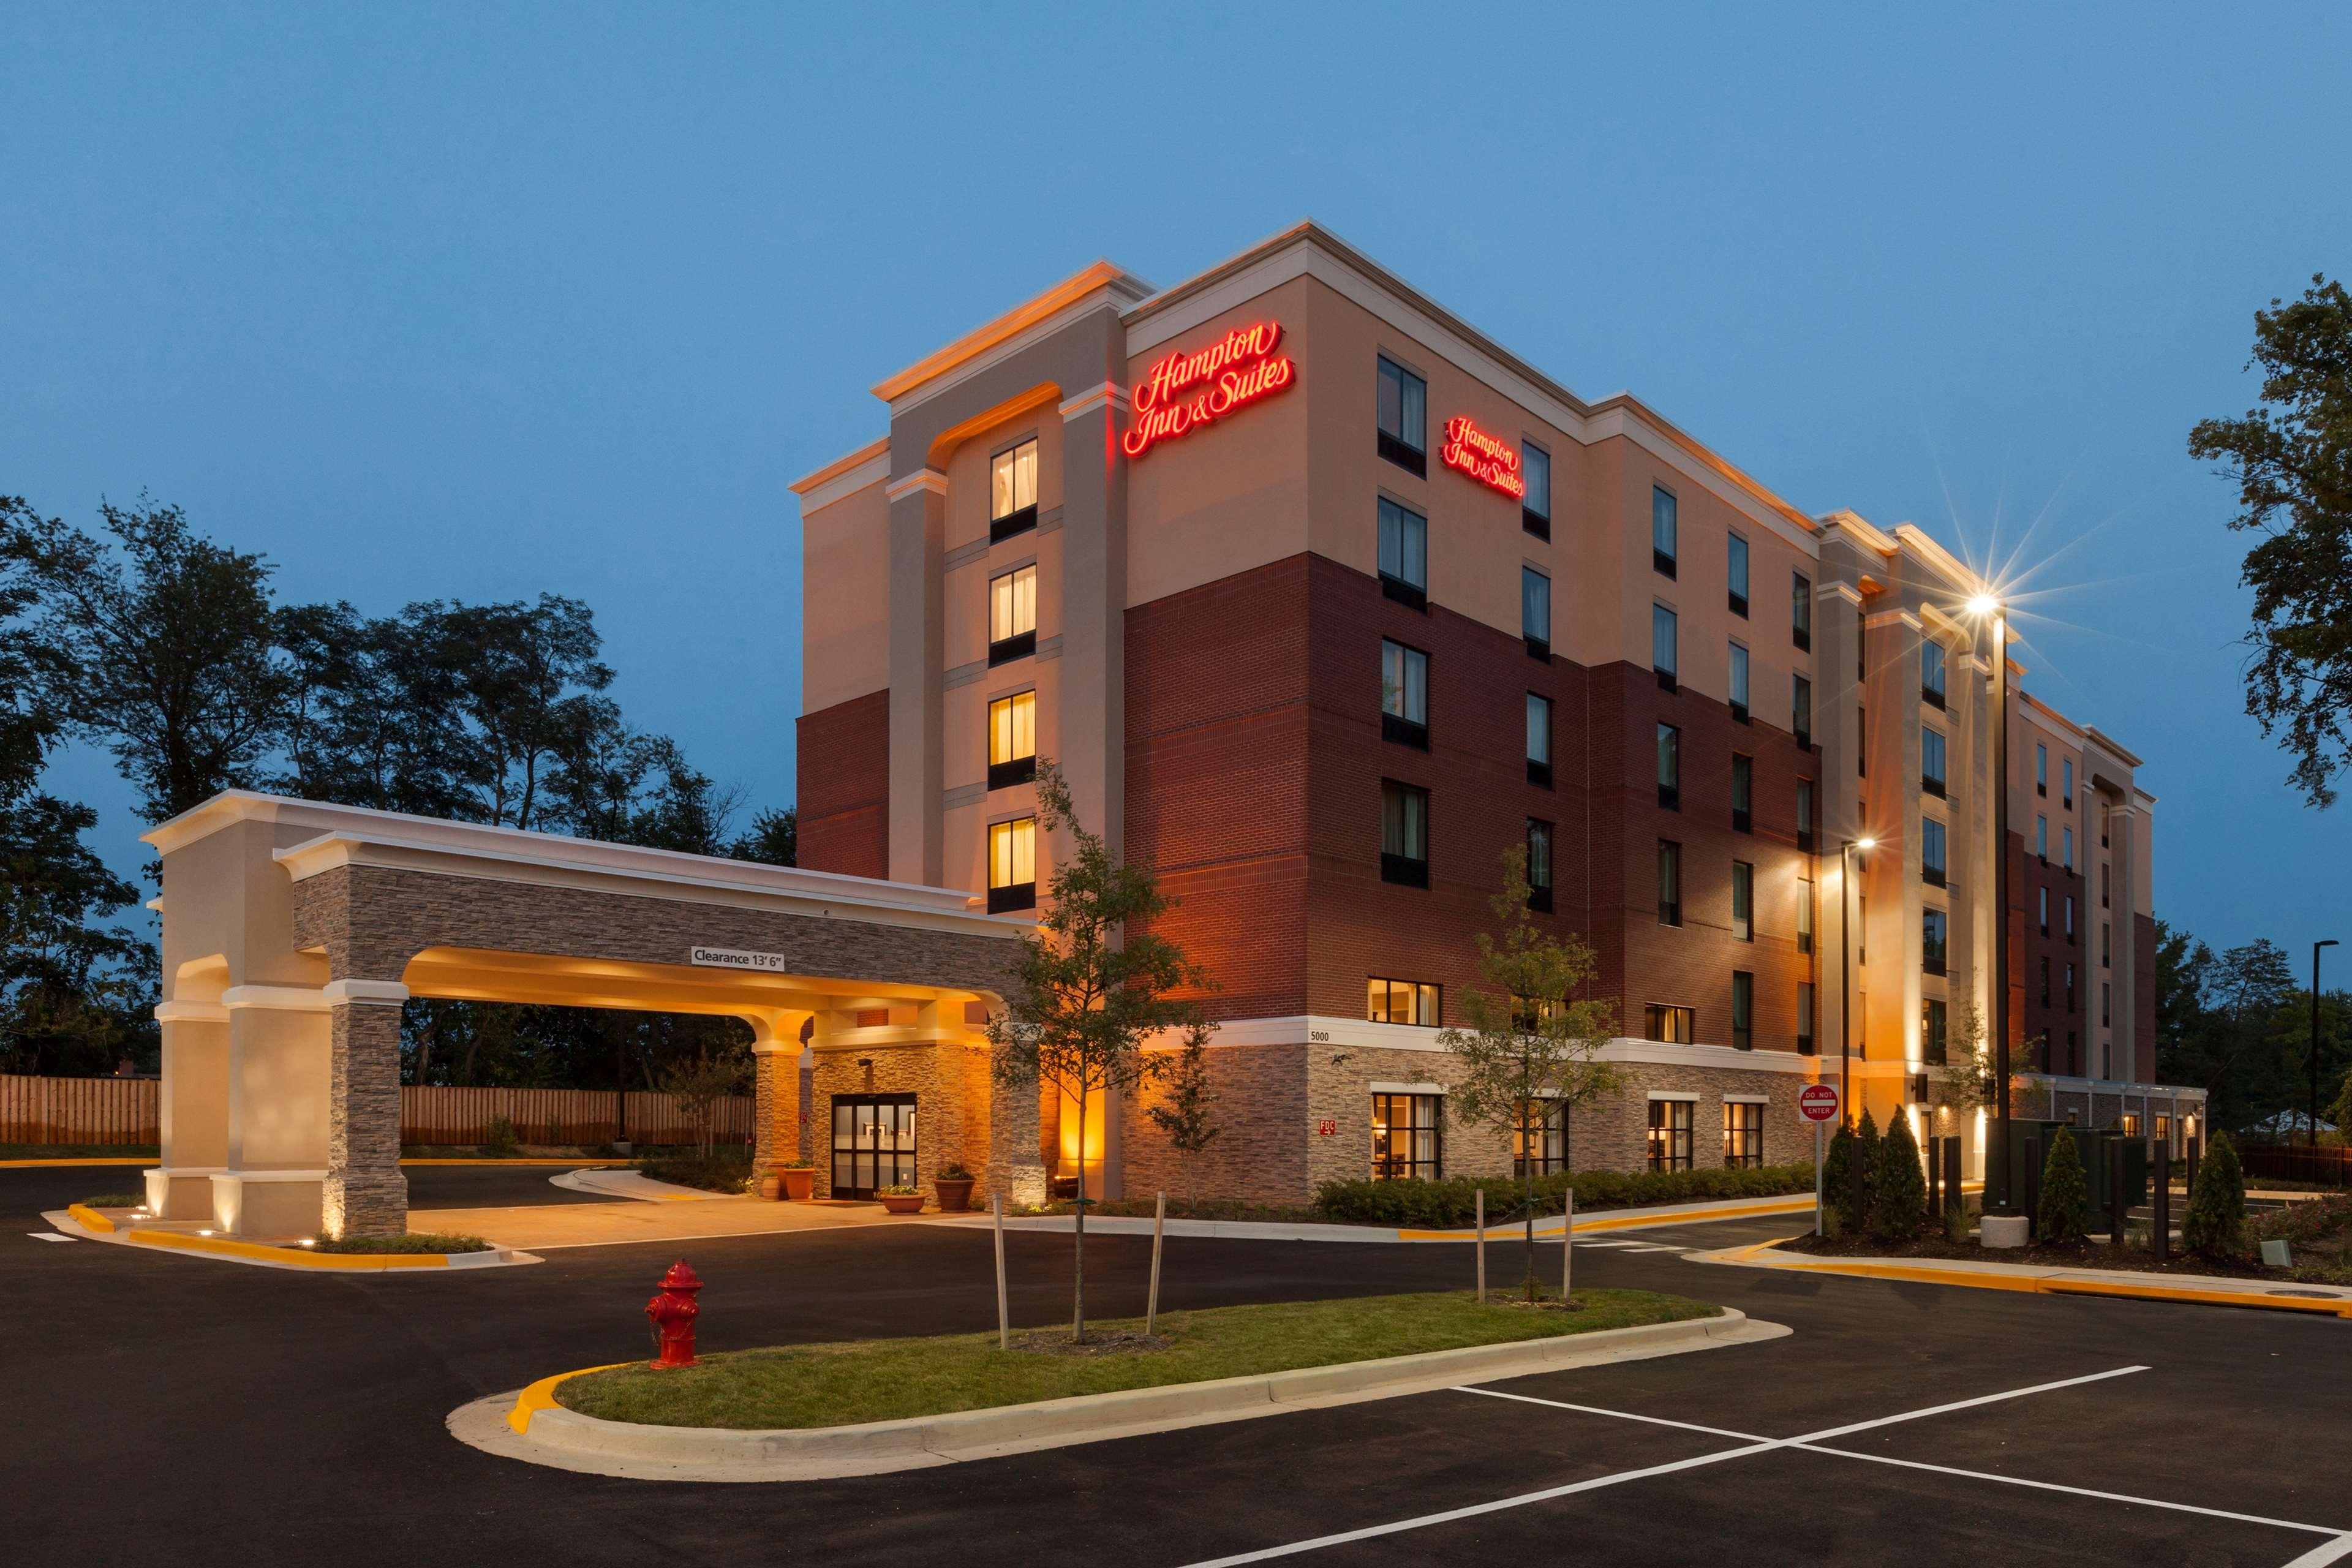 Hampton Inn & Suites Camp Springs/Andrews AFB image 0